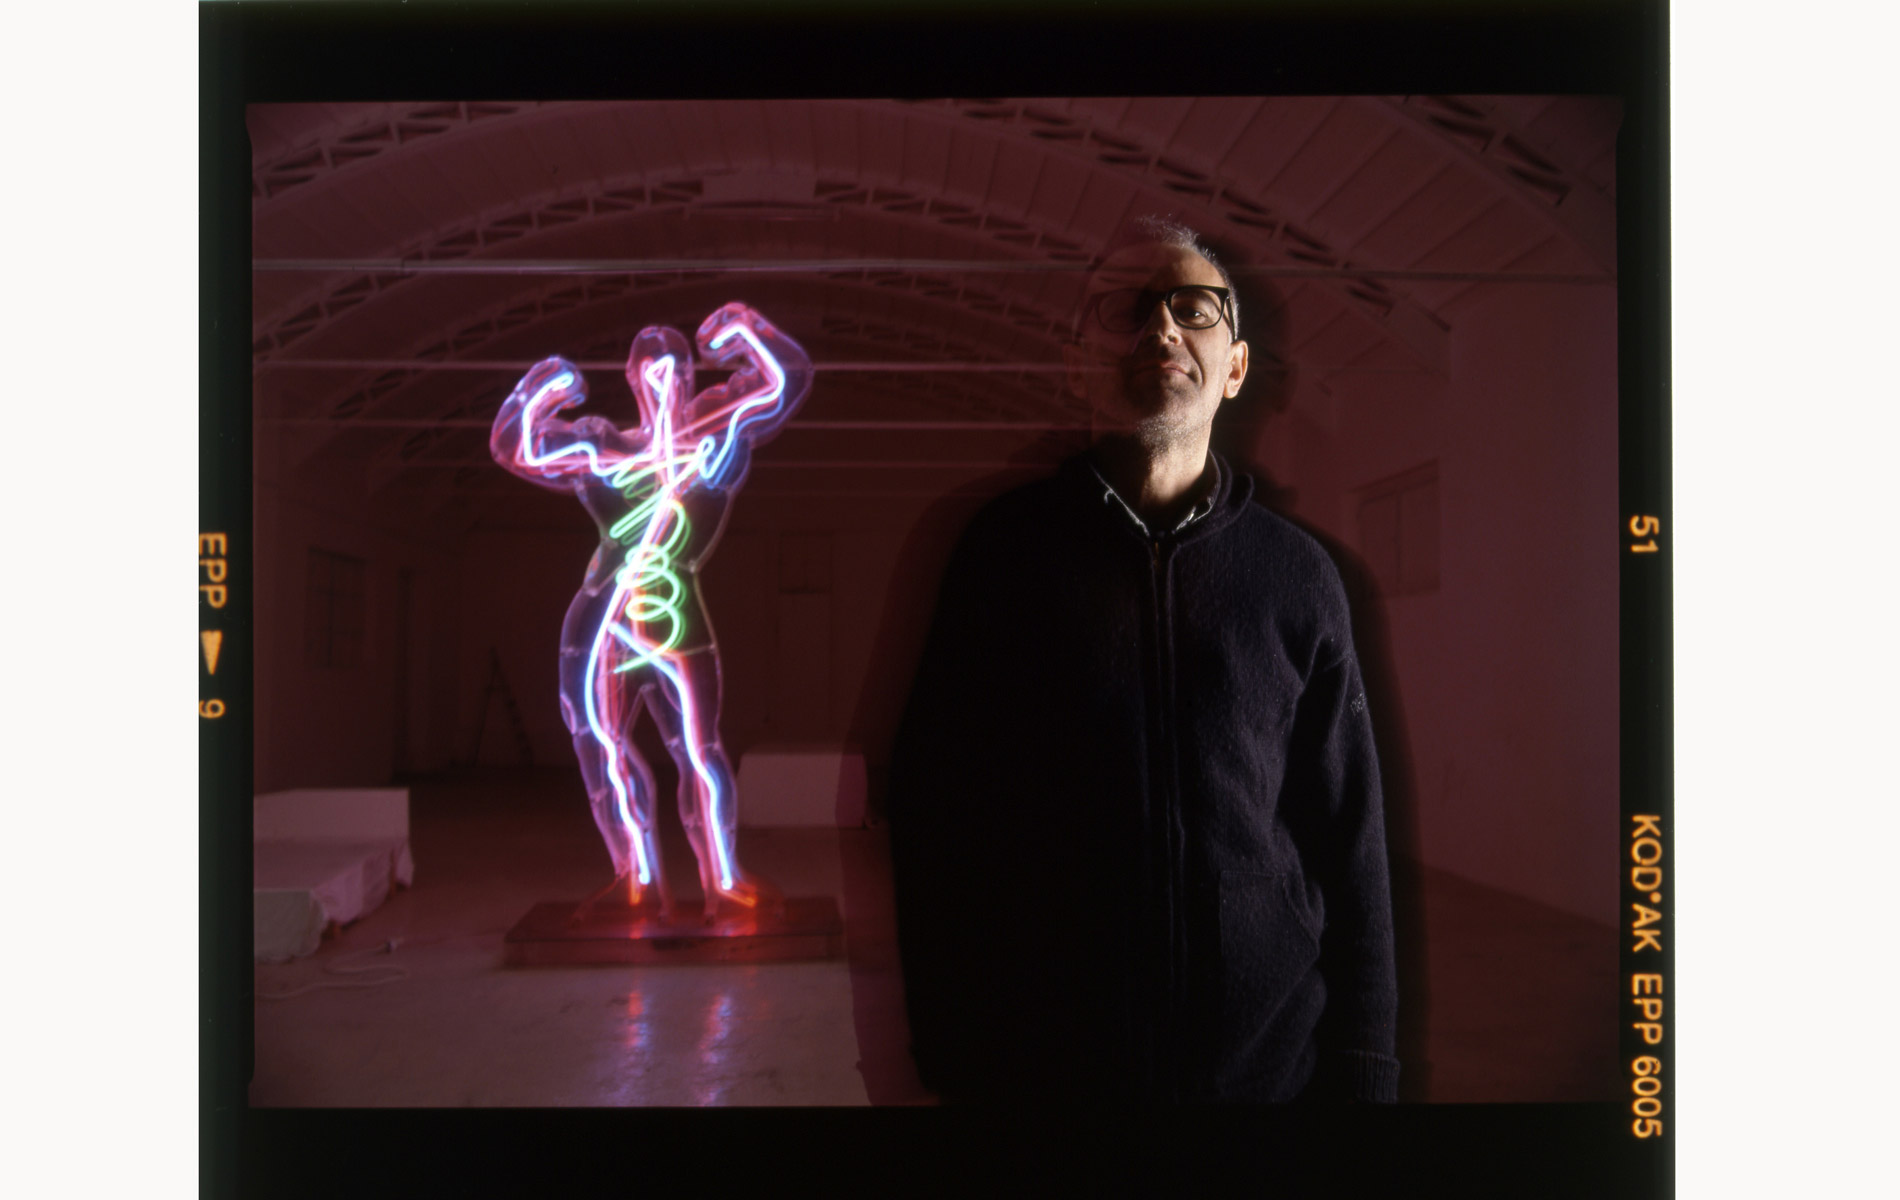 MARCO LODOLA - Italian sculptor - Portraits Exhibition - © Graziano Villa